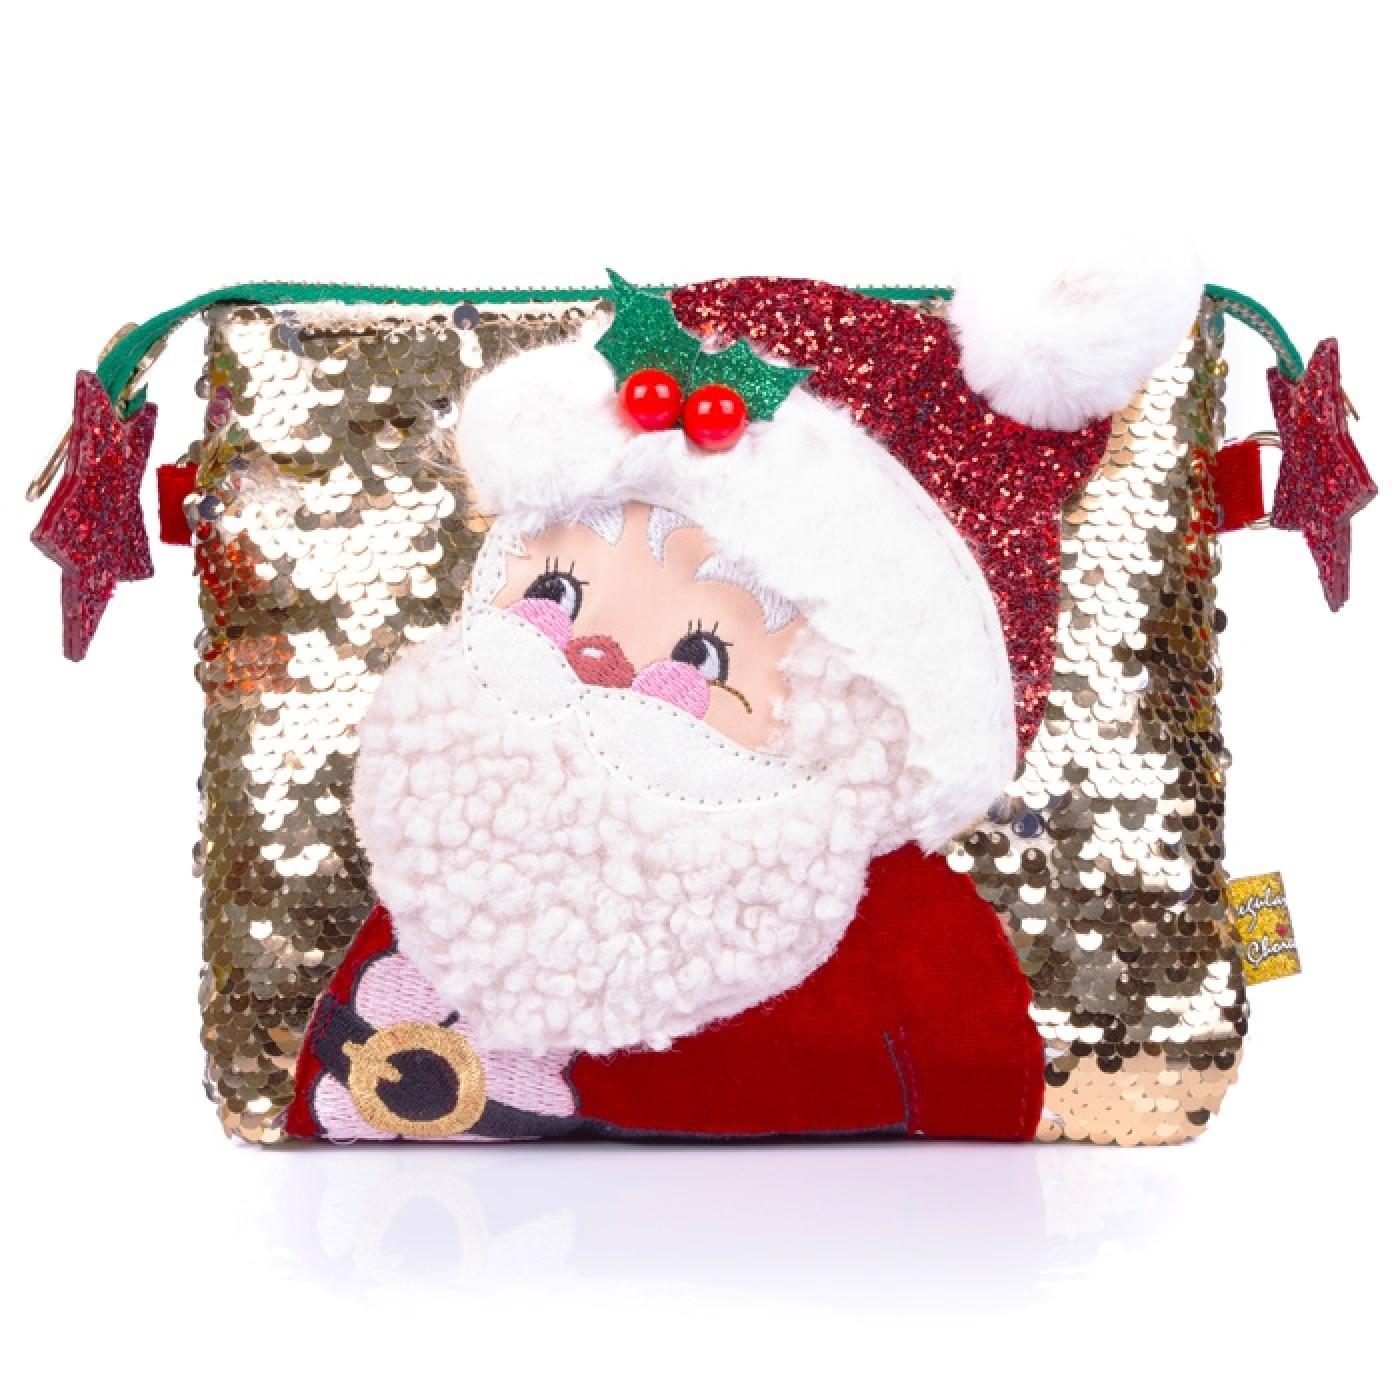 The Kringles Bag